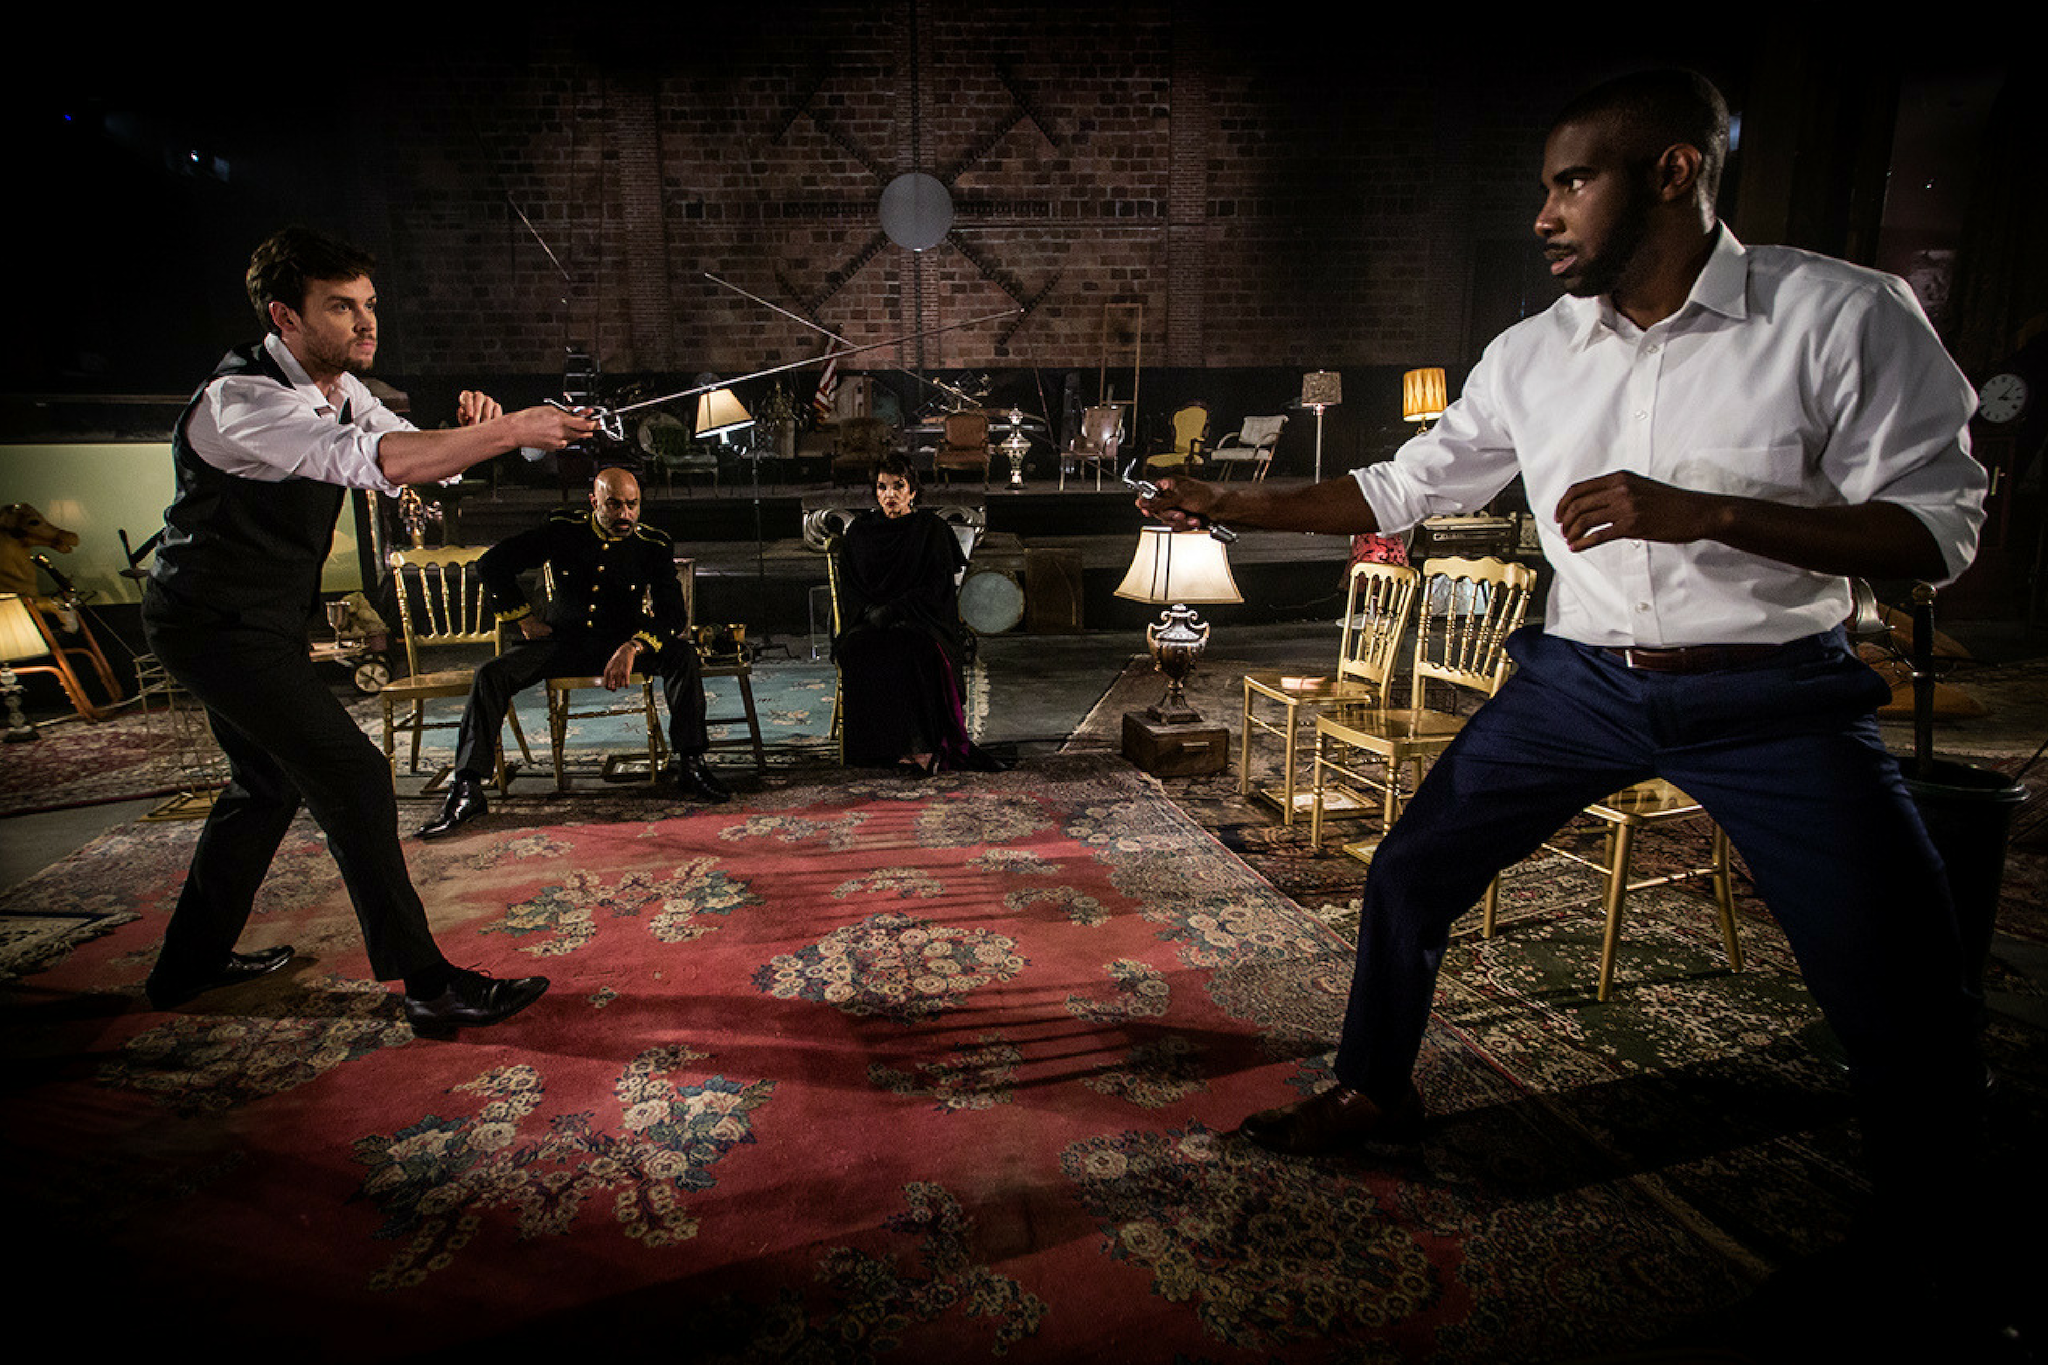 Jack Cutmore-Scott (Hamlet), Faran Tahir (Claudius), Brooke Adams (Queen gertrude), and Desean Kevin Terry (Laertes) in Hamlet 360: Thy Father's Spirit. Photo by Matthew Niederhauser